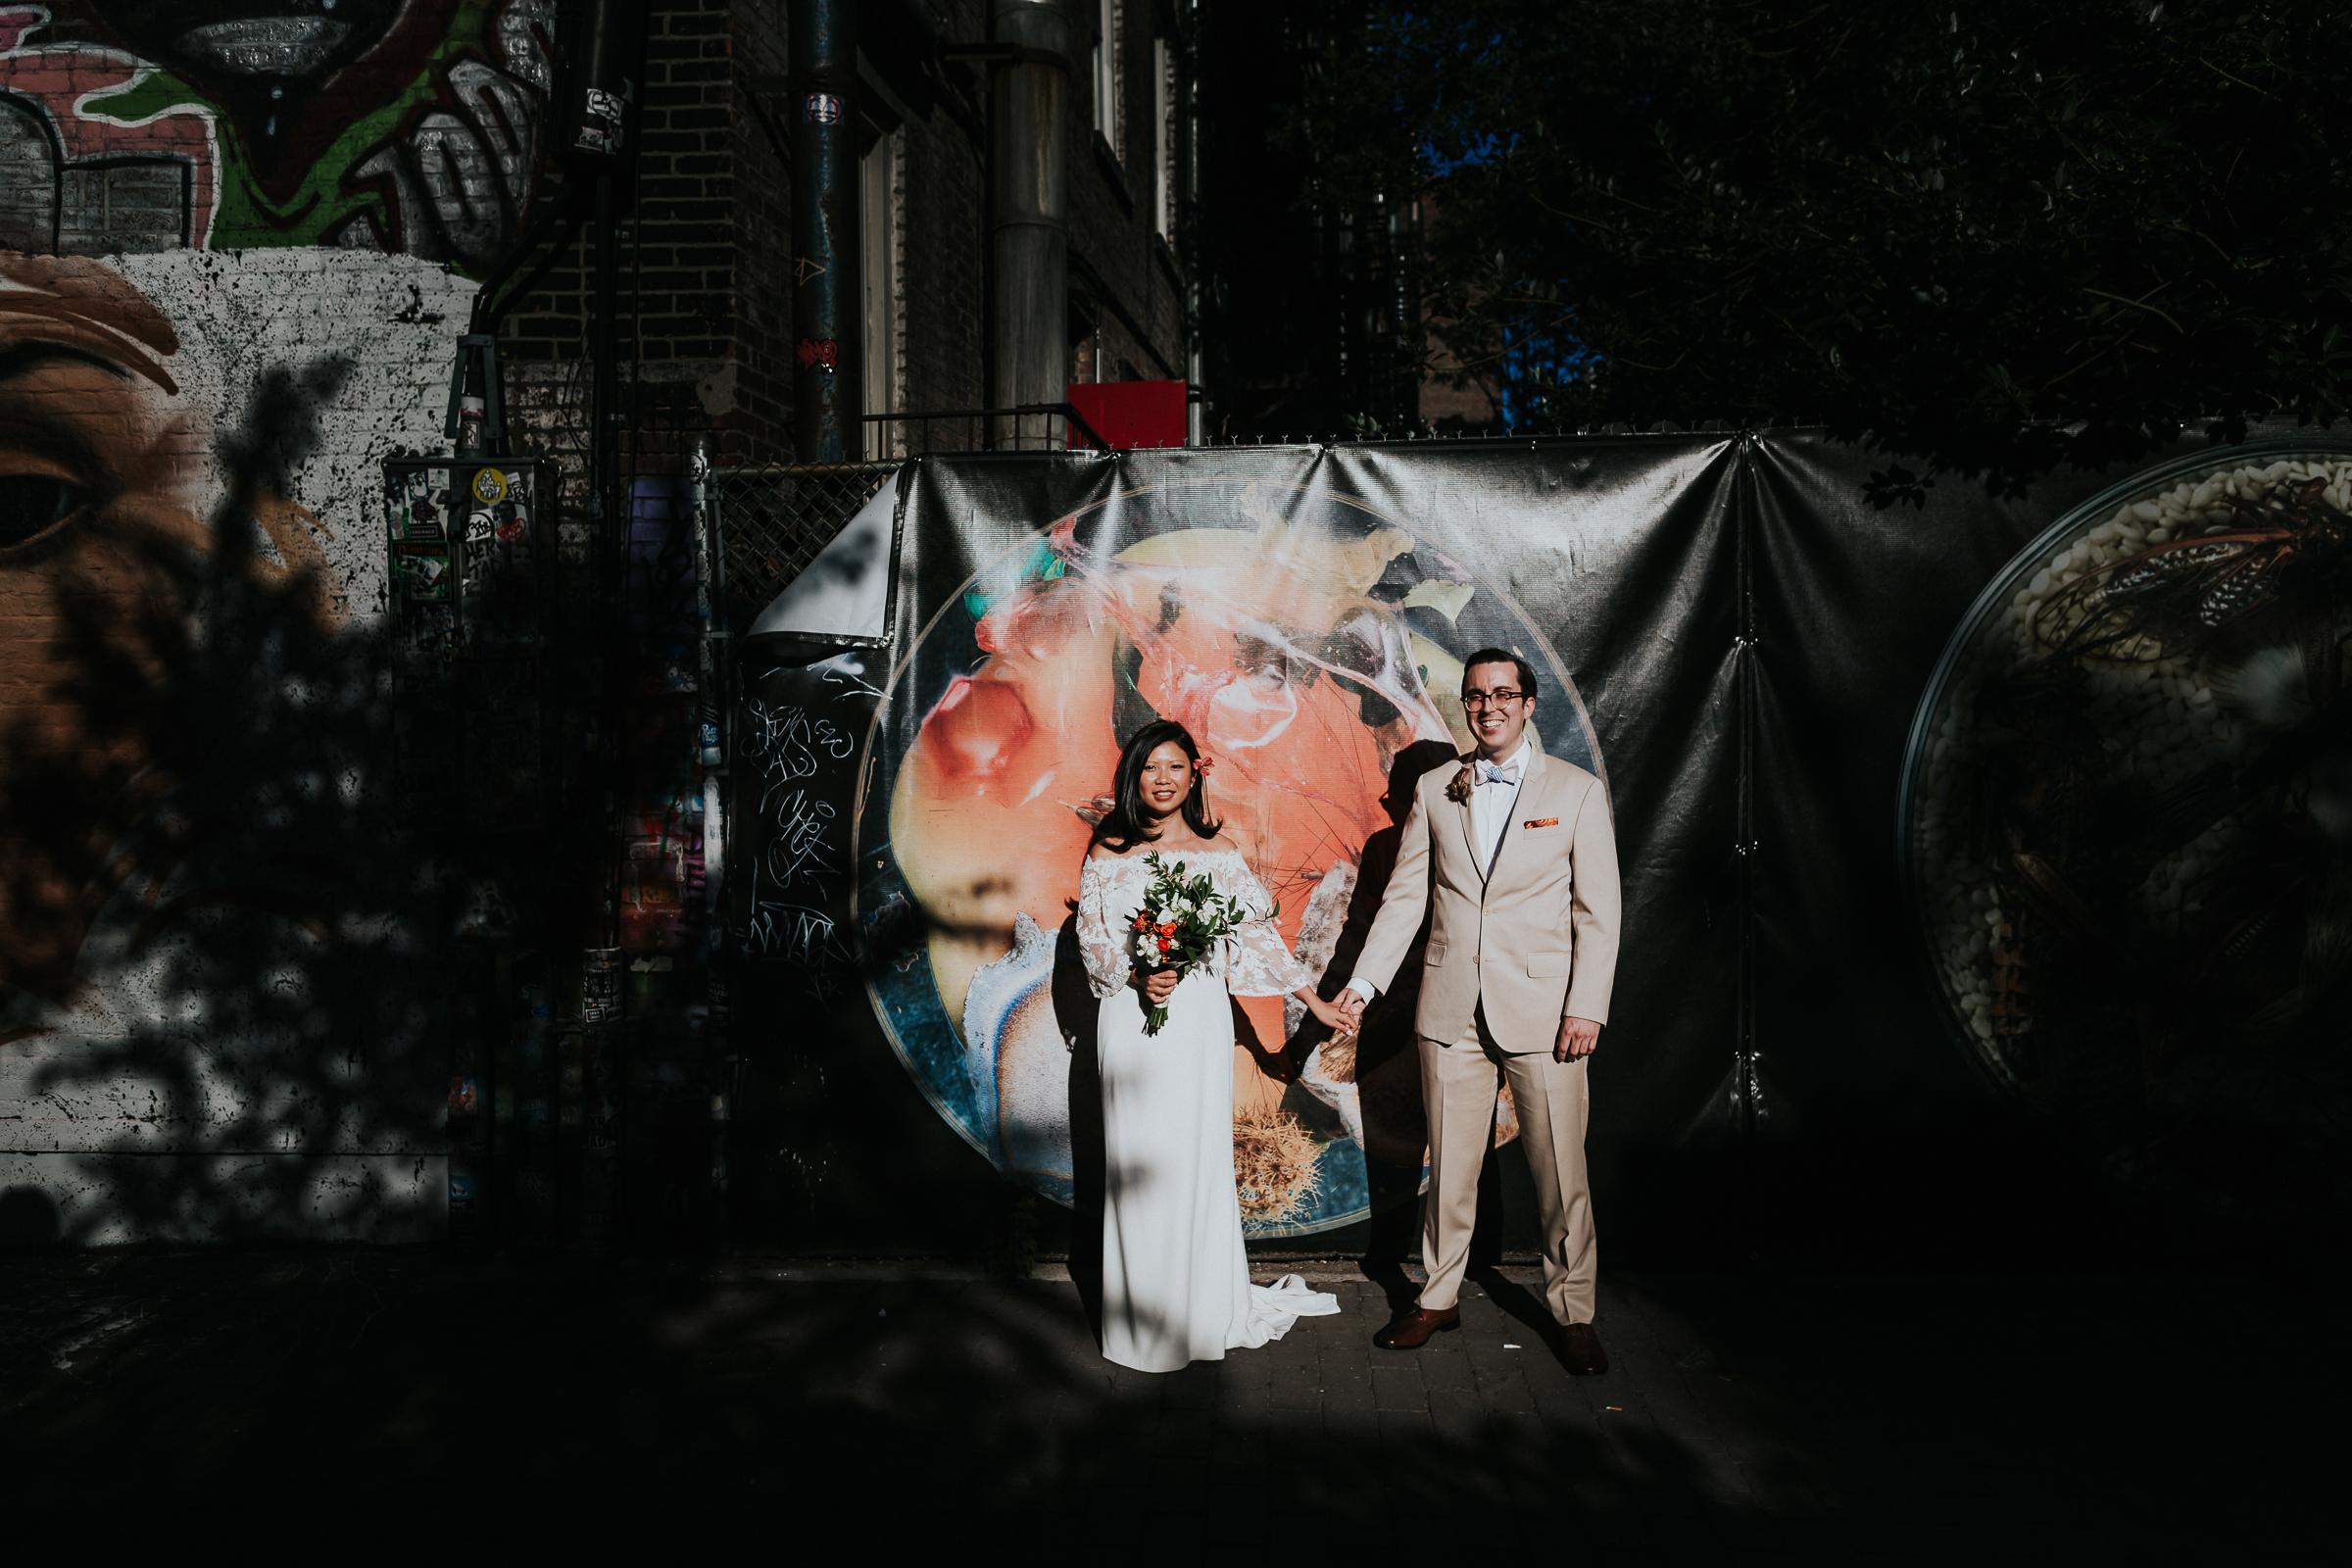 The-Bhakti-Center-Yoga-NYC-Rooftop-Documentary-Wedding-Photographer-9.jpg